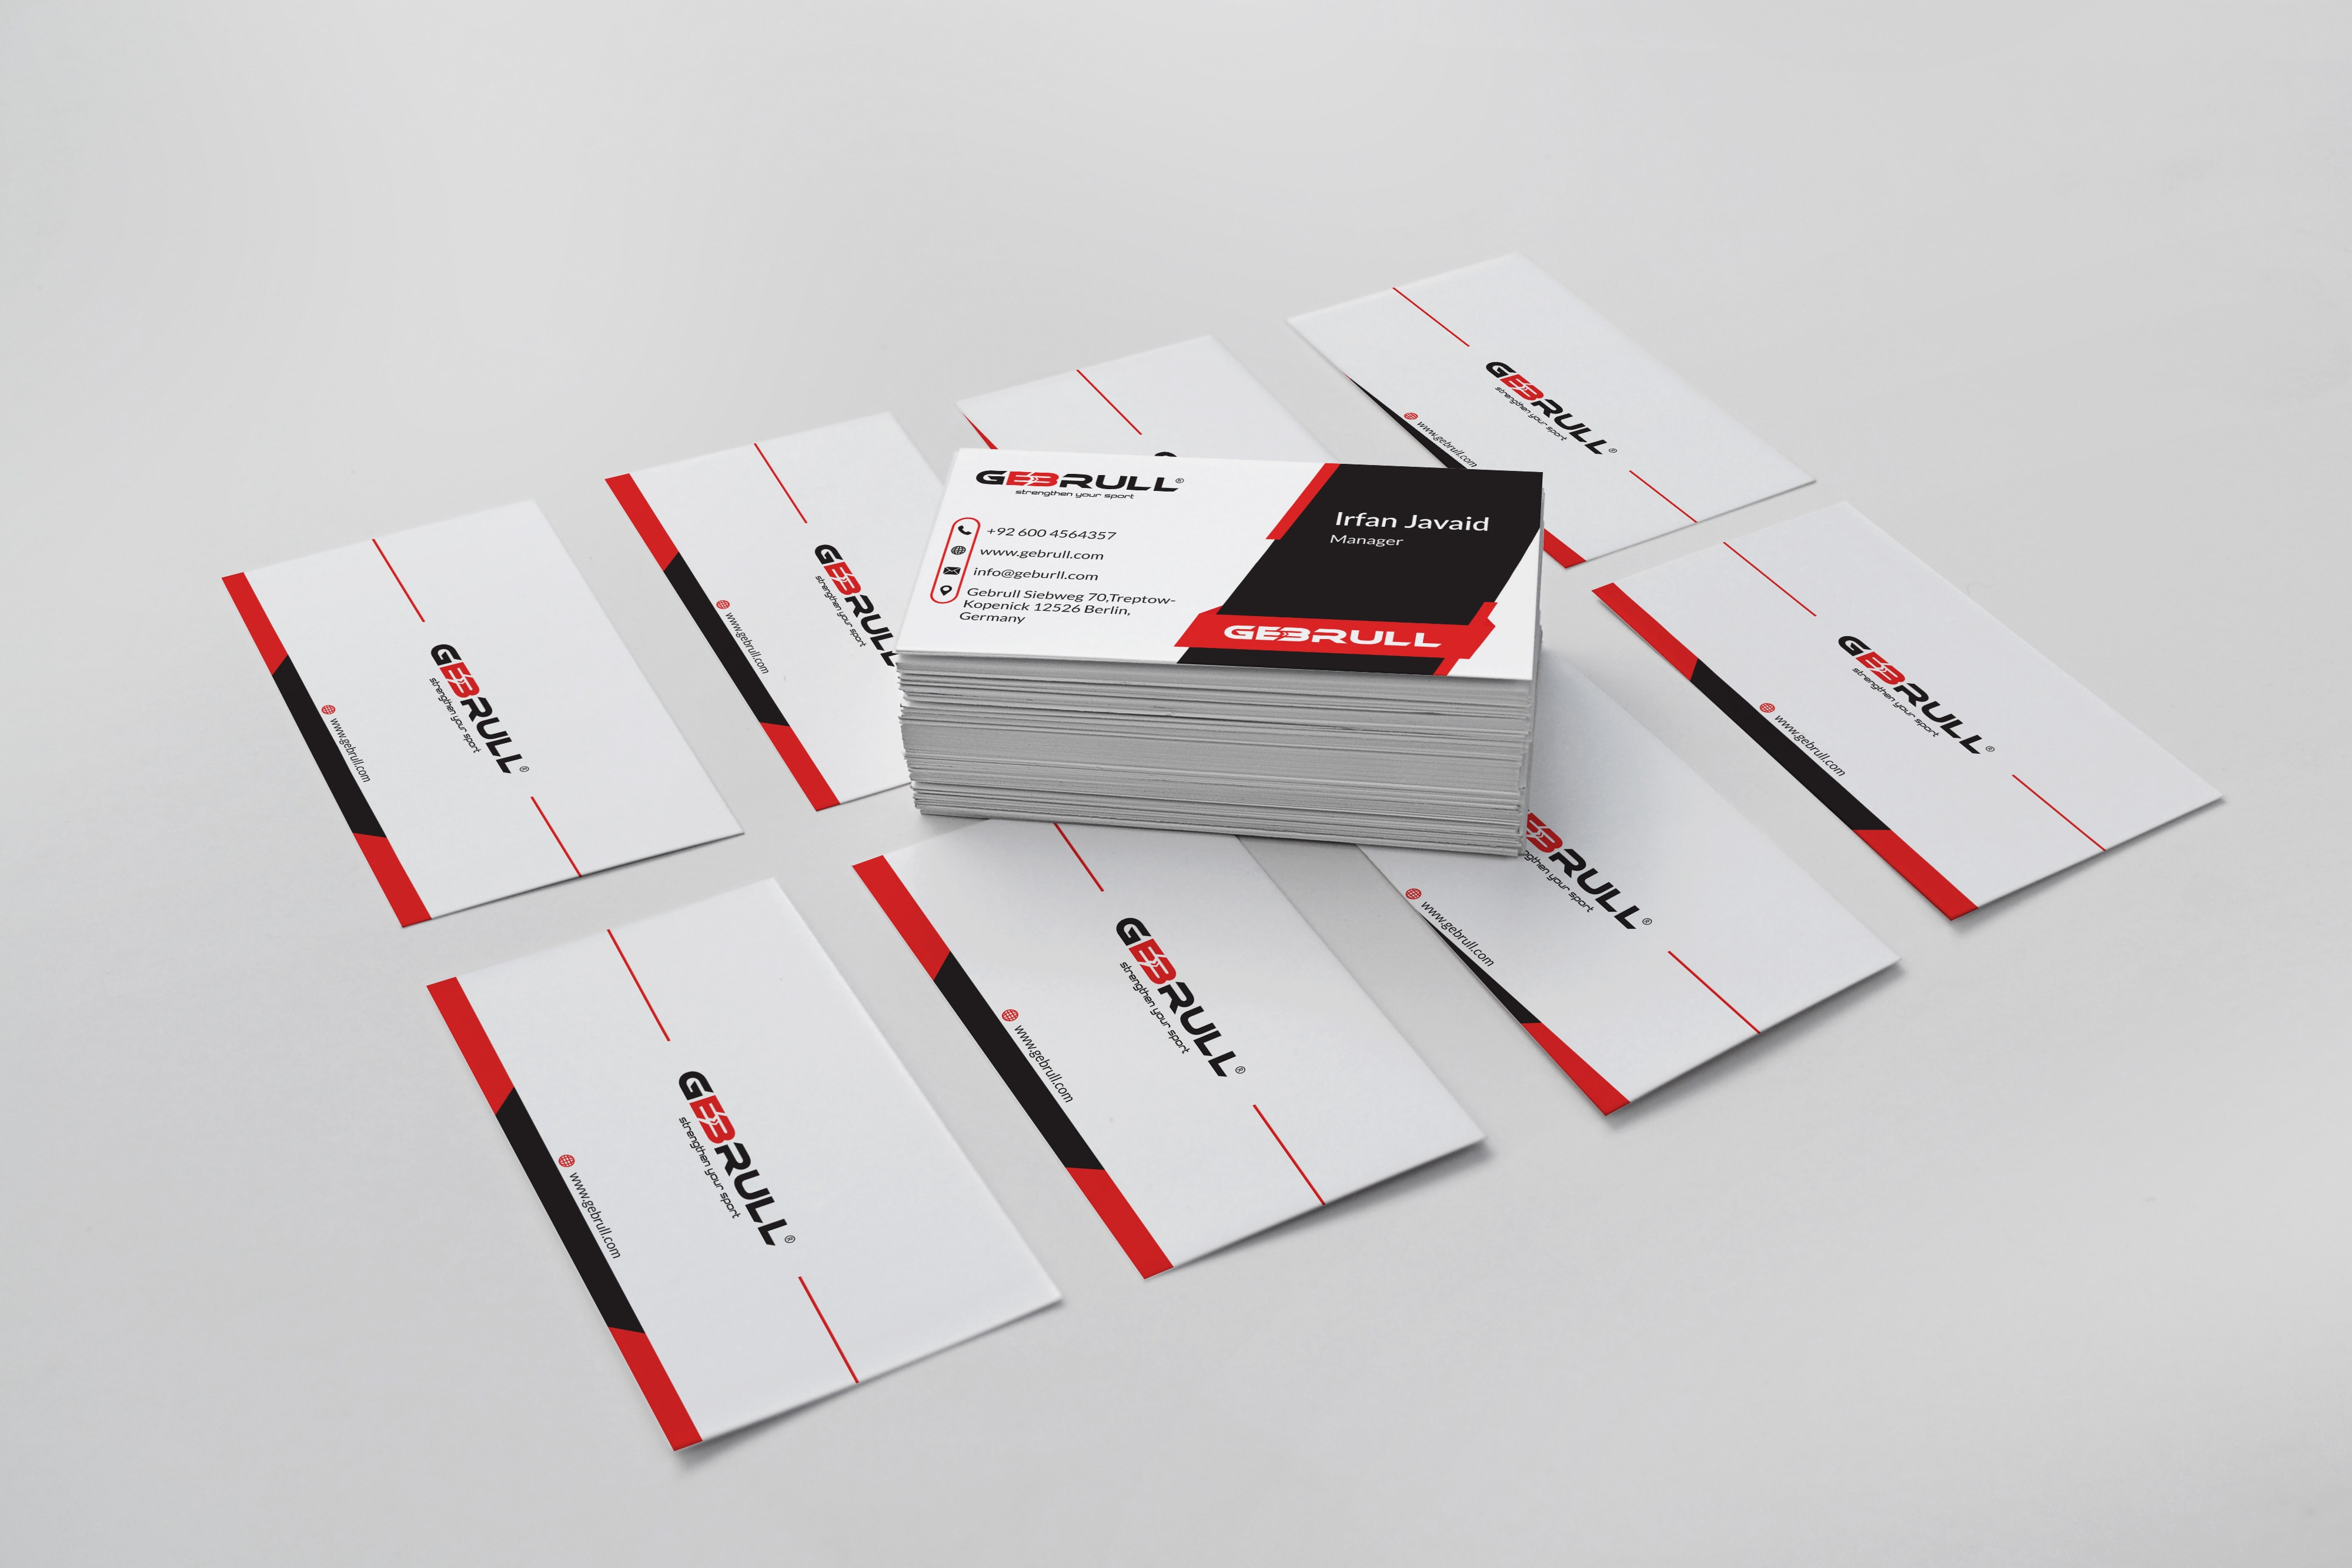 GebRull Business Card Design